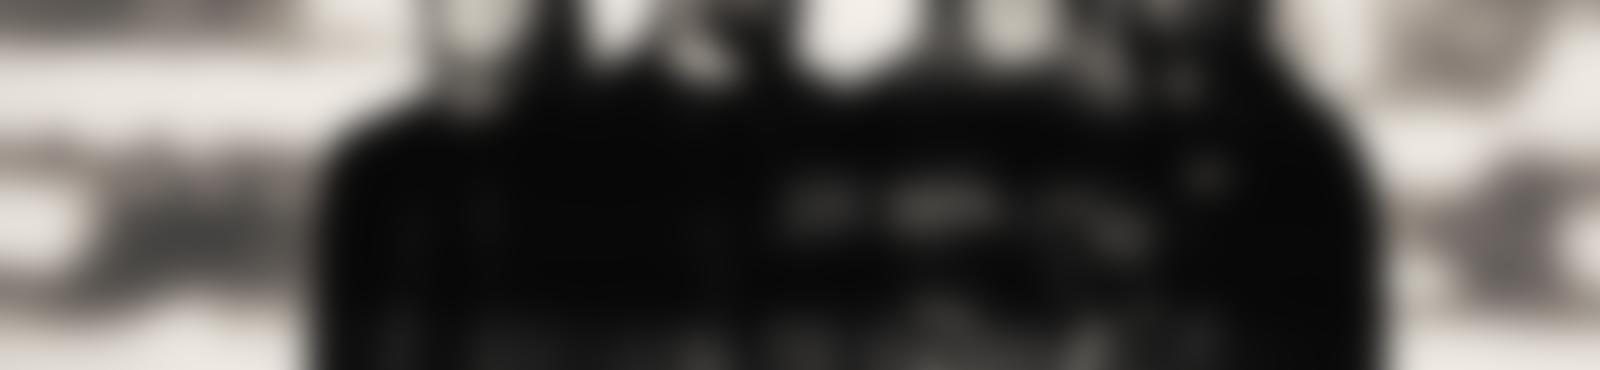 Blurred 48f74521 e005 4fa7 8f5d 4cbfd10f0c84